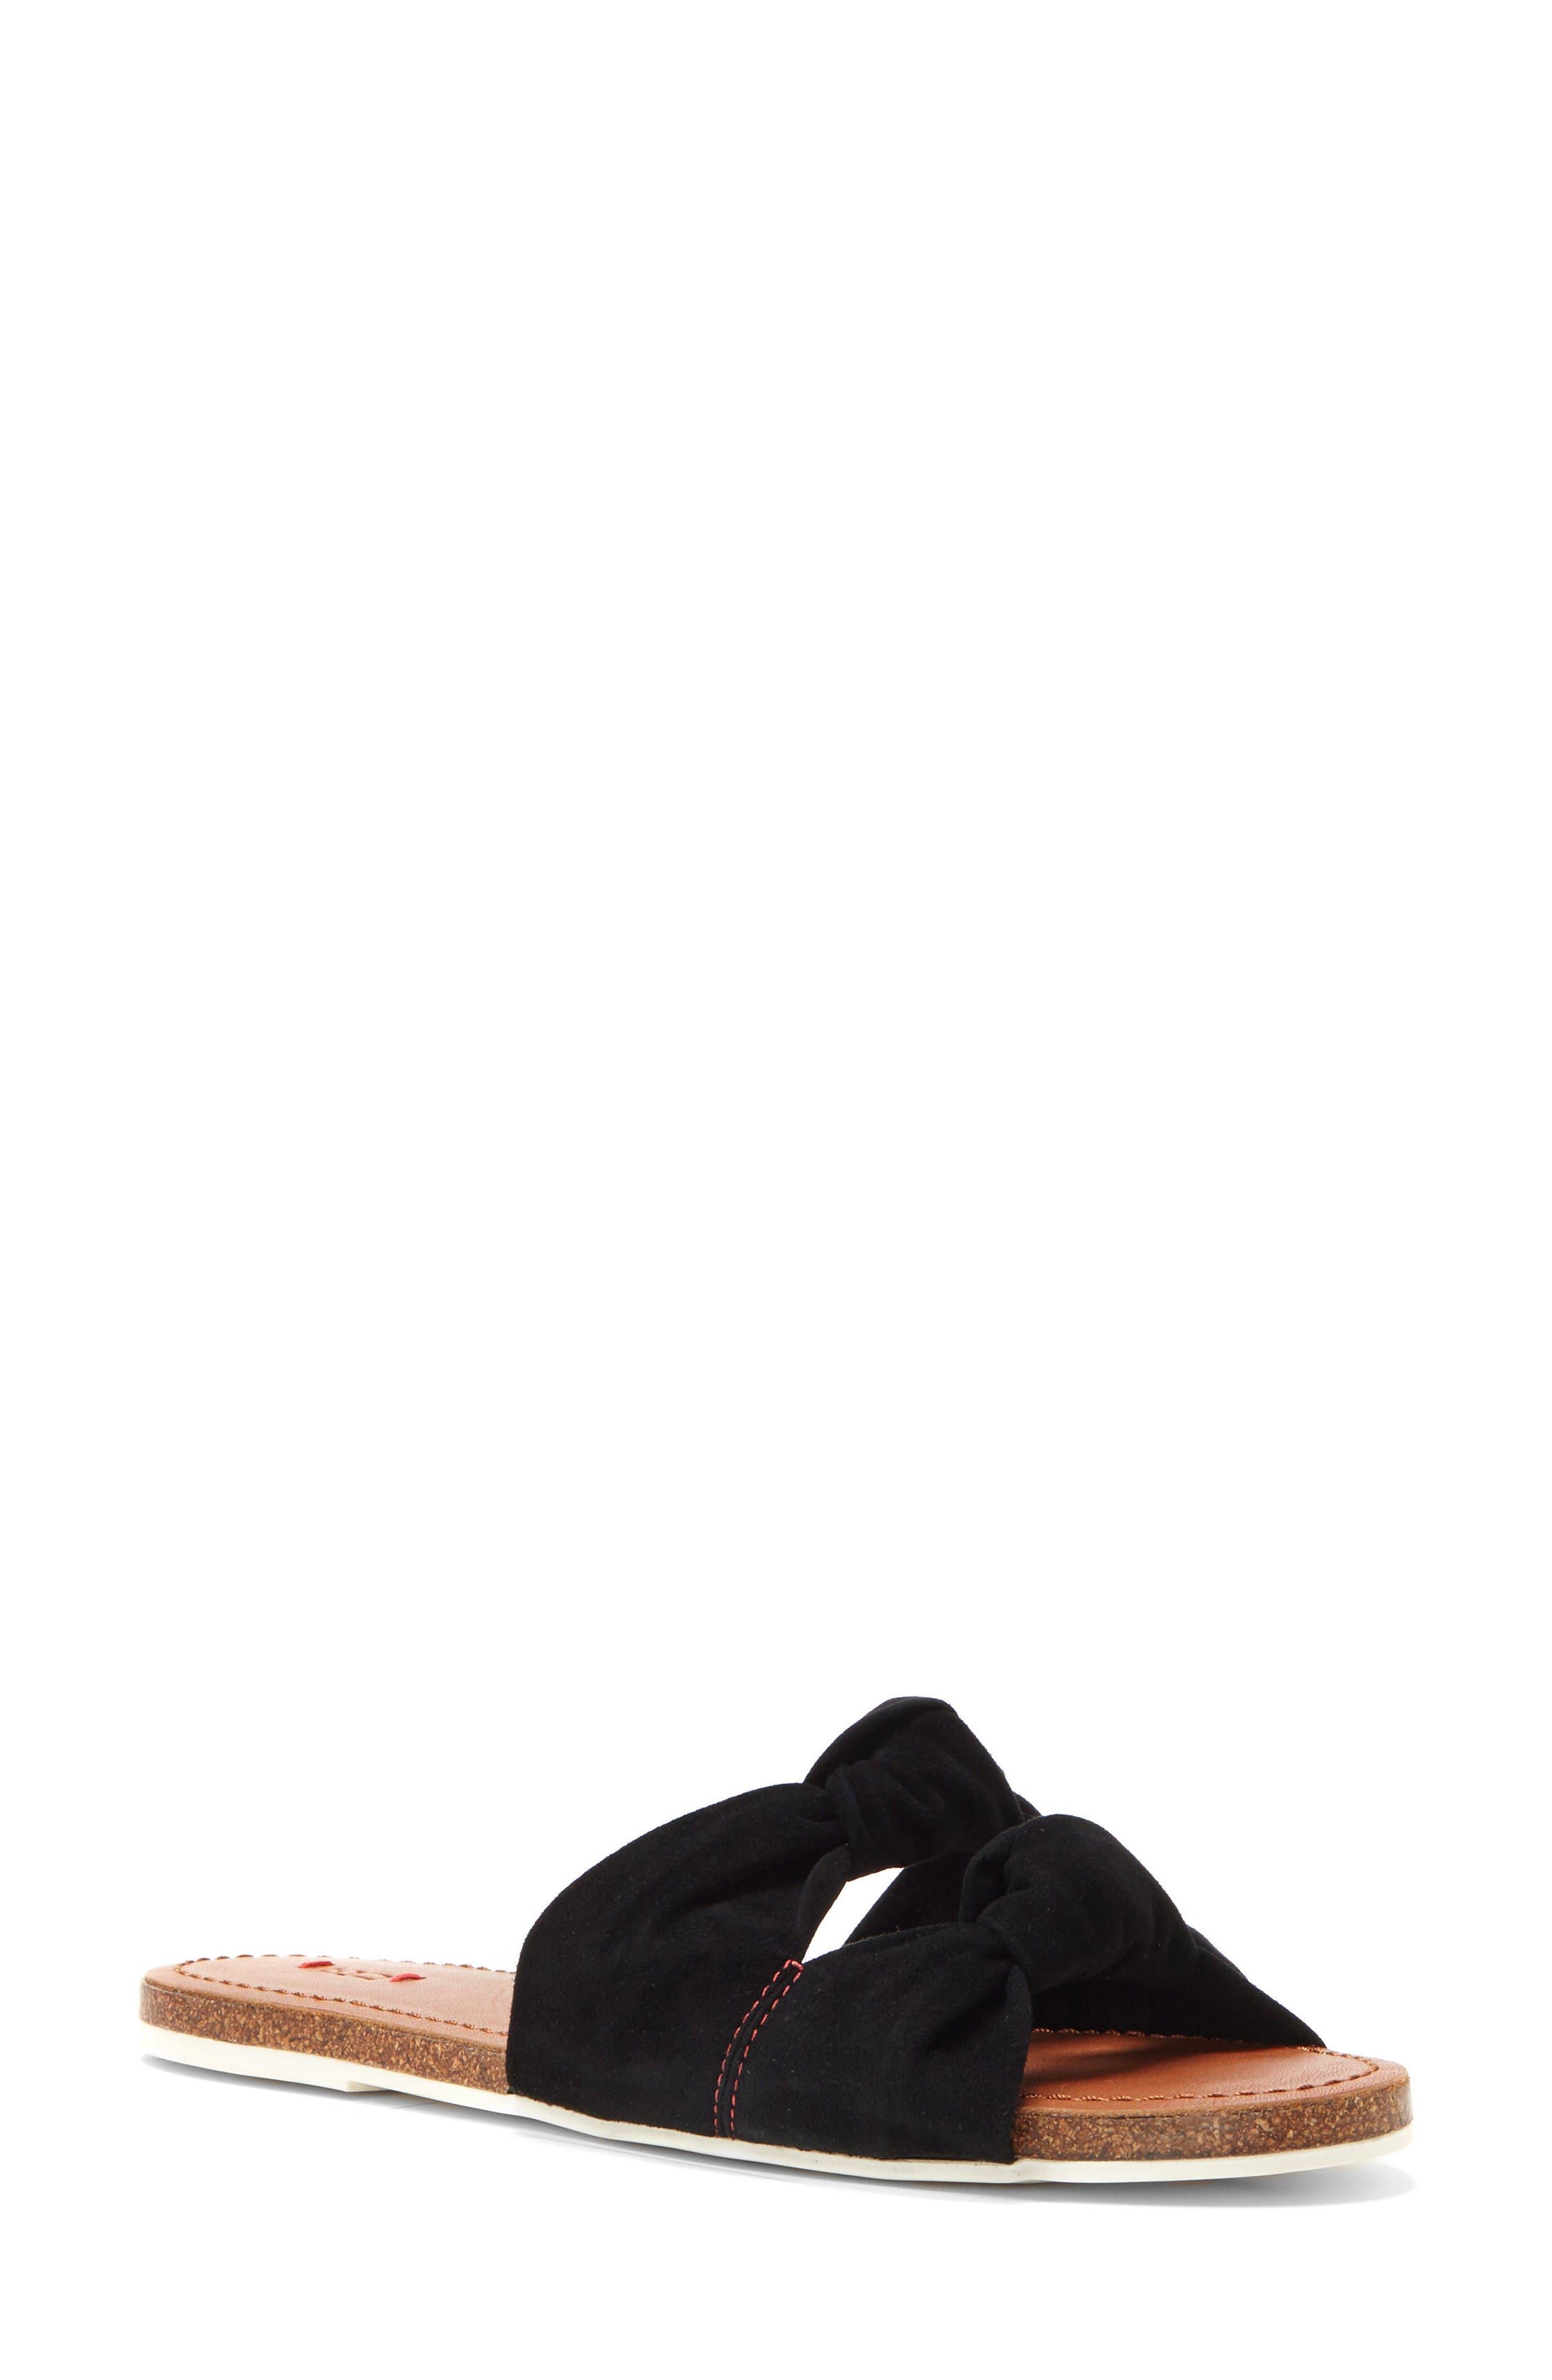 ED Ellen DeGeneres Womens Shiri Black Suede Oxford  EOPEP56G8